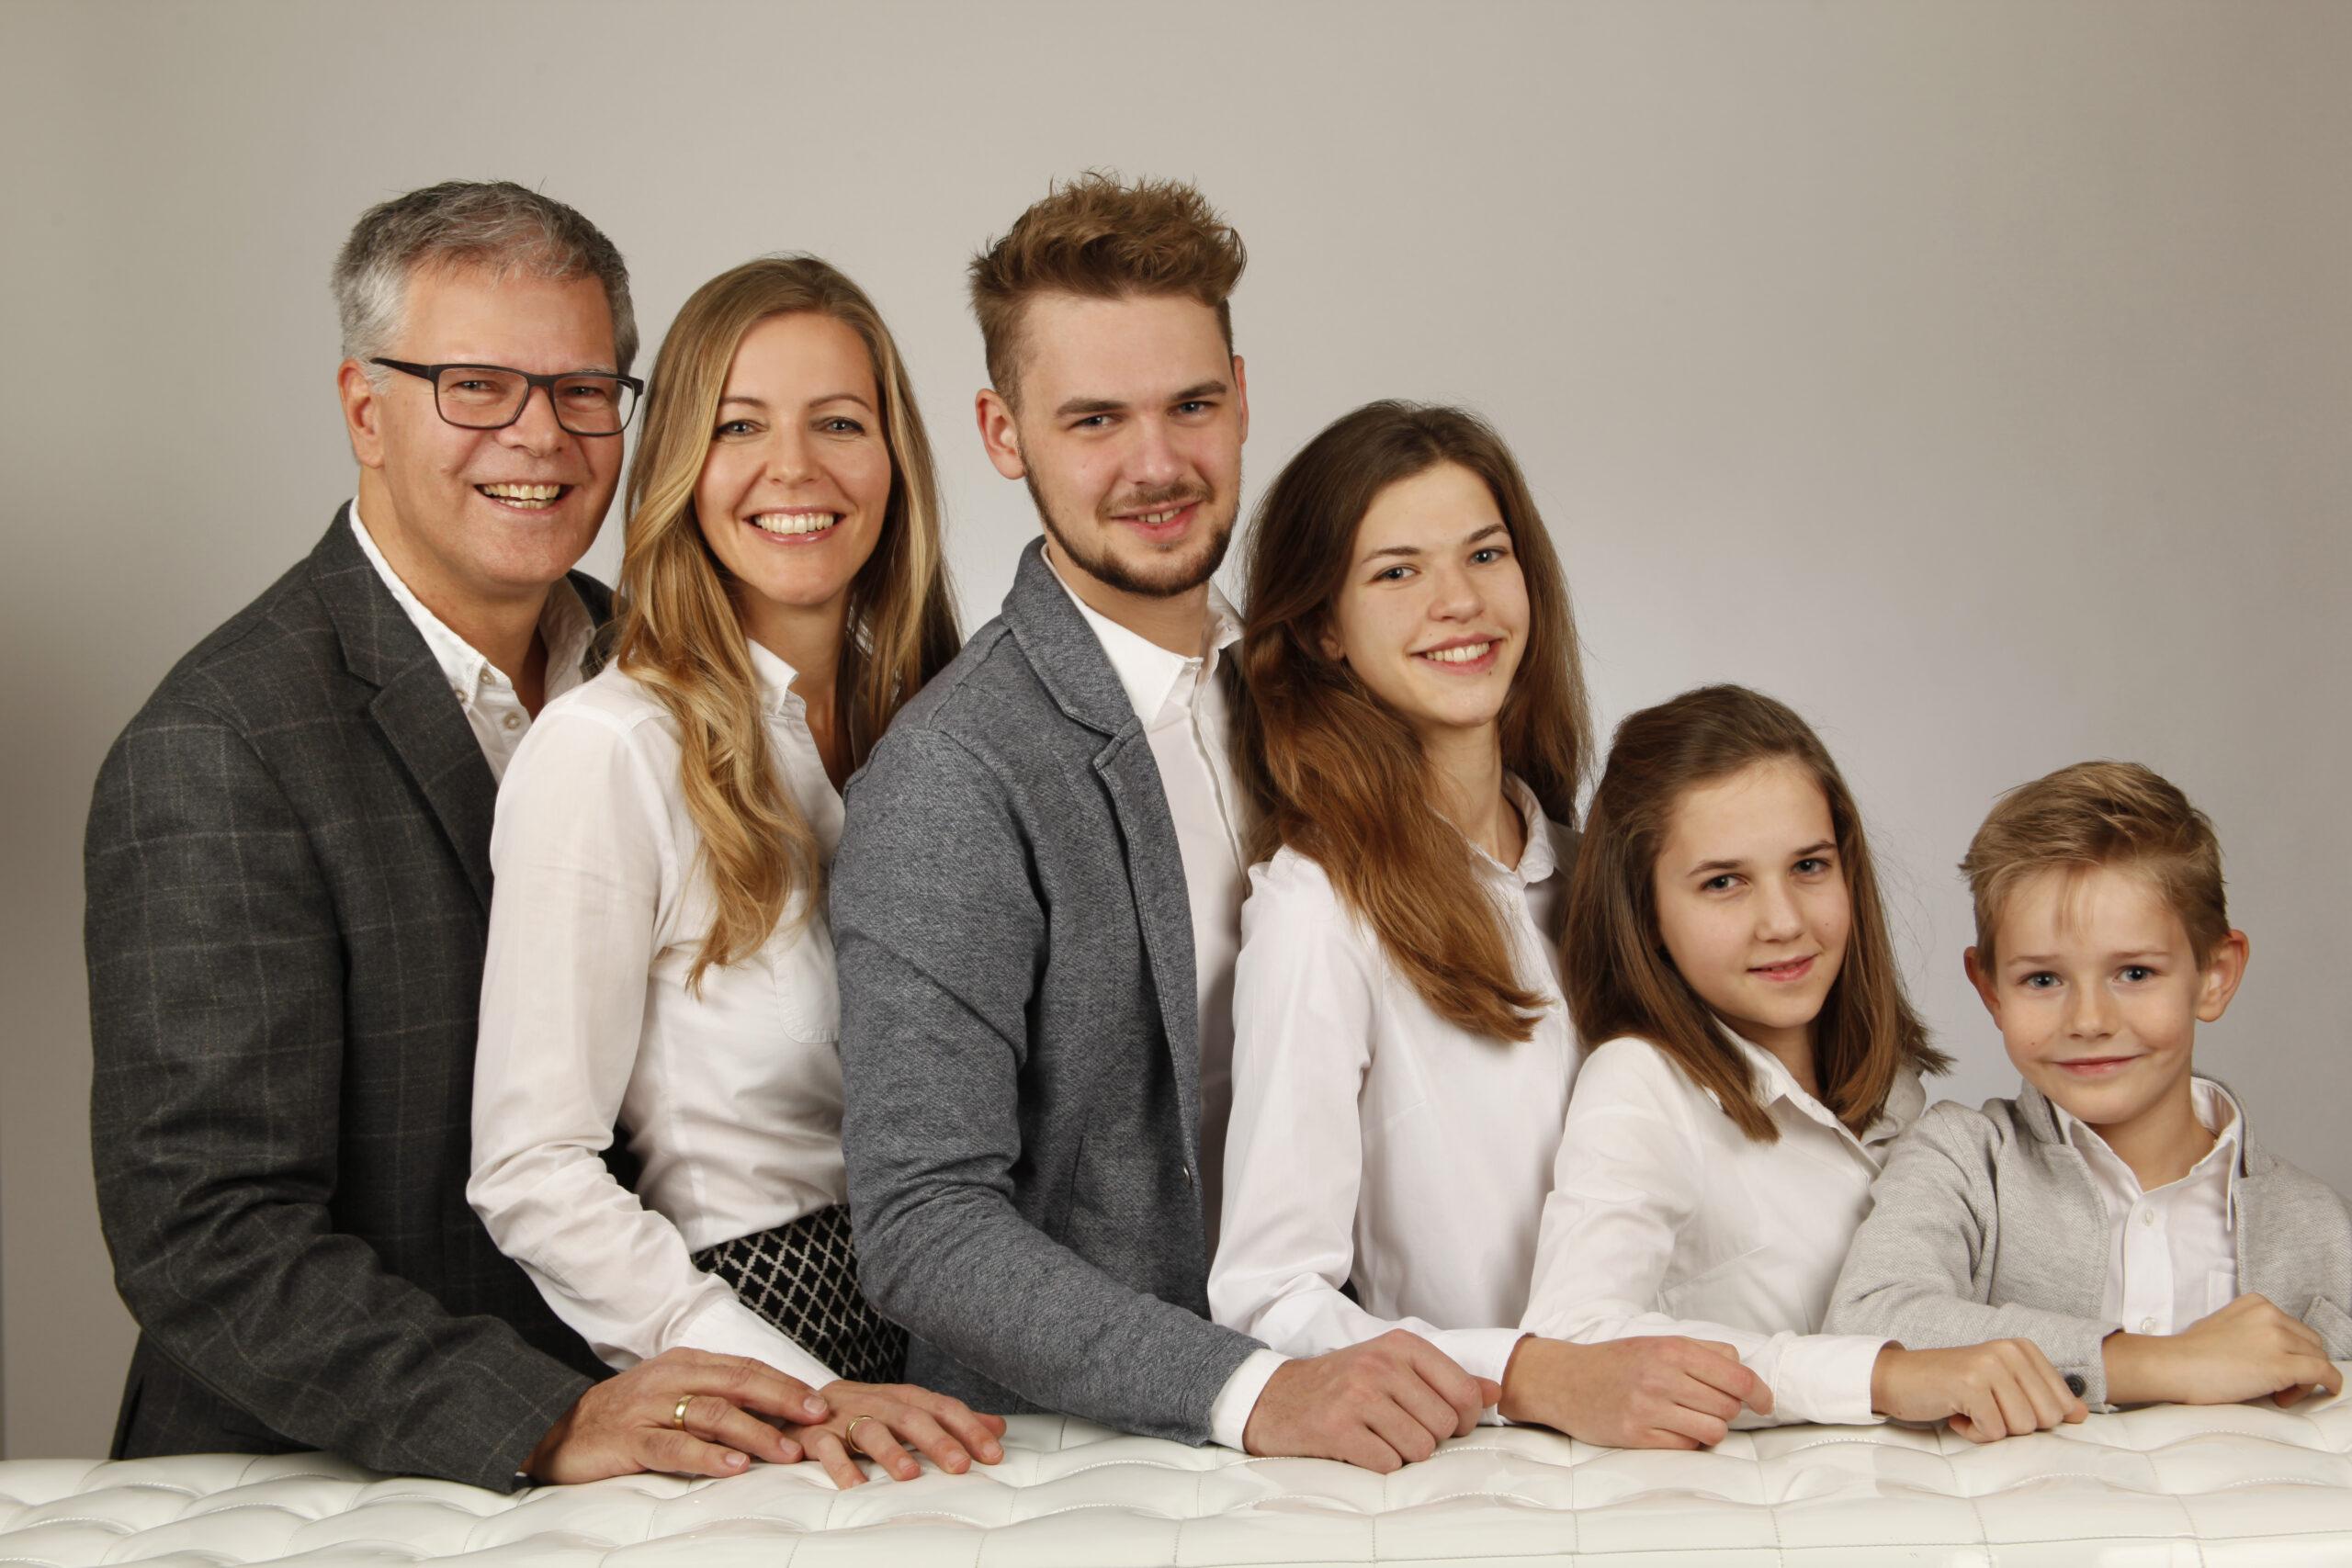 Familienfoto mit 4 Kinder